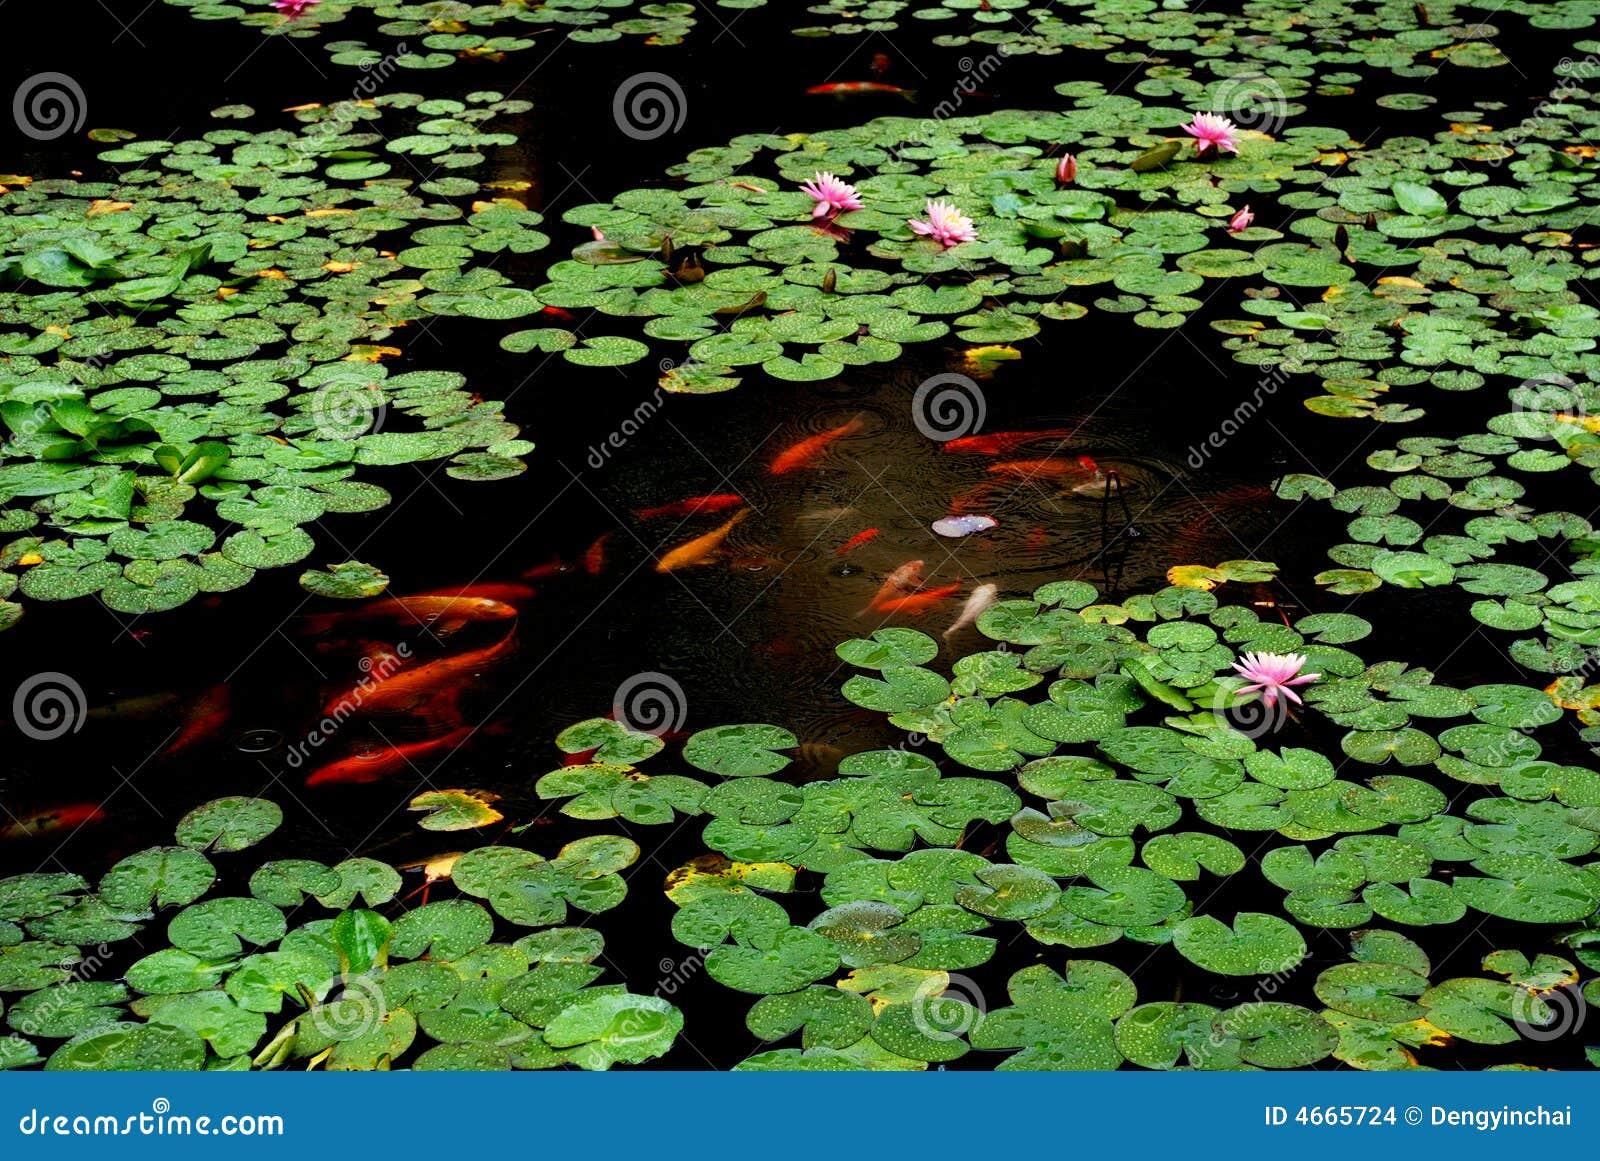 Lotus pond in the rain stock photo image of lily for Koi fish pond lotus